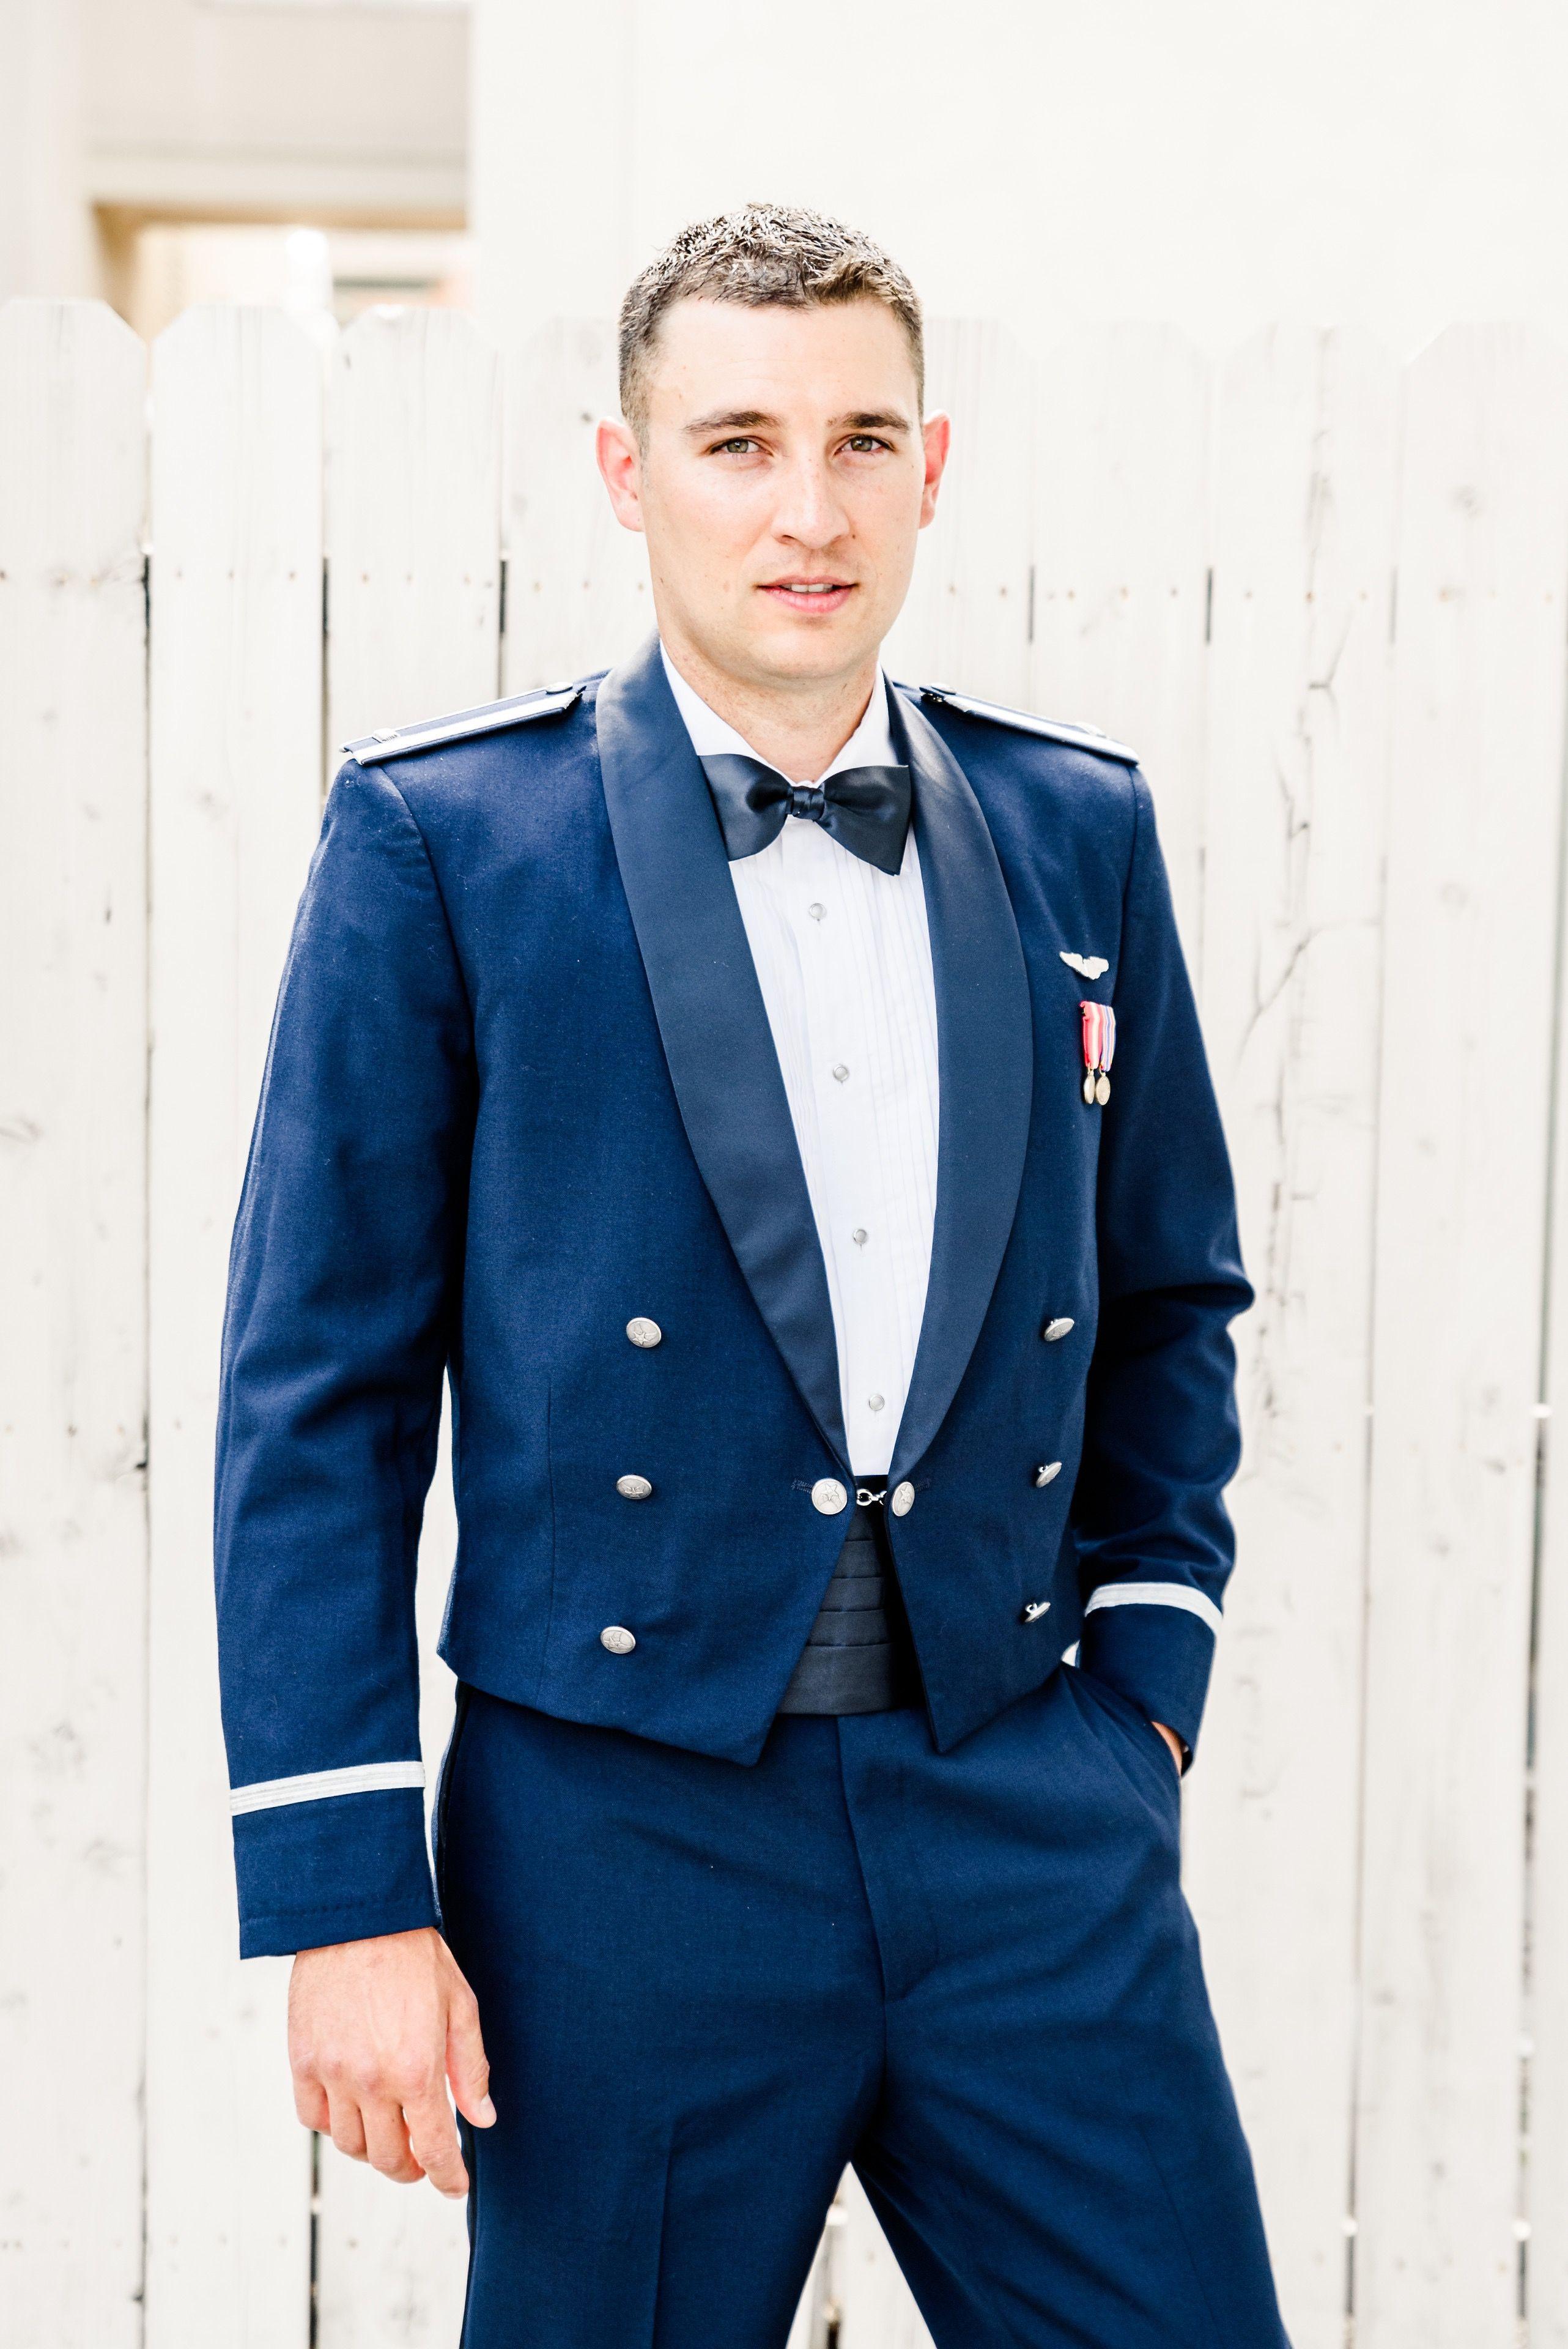 Groomsmen photos, wedding guys, wedding suits, groomsmen poses ...